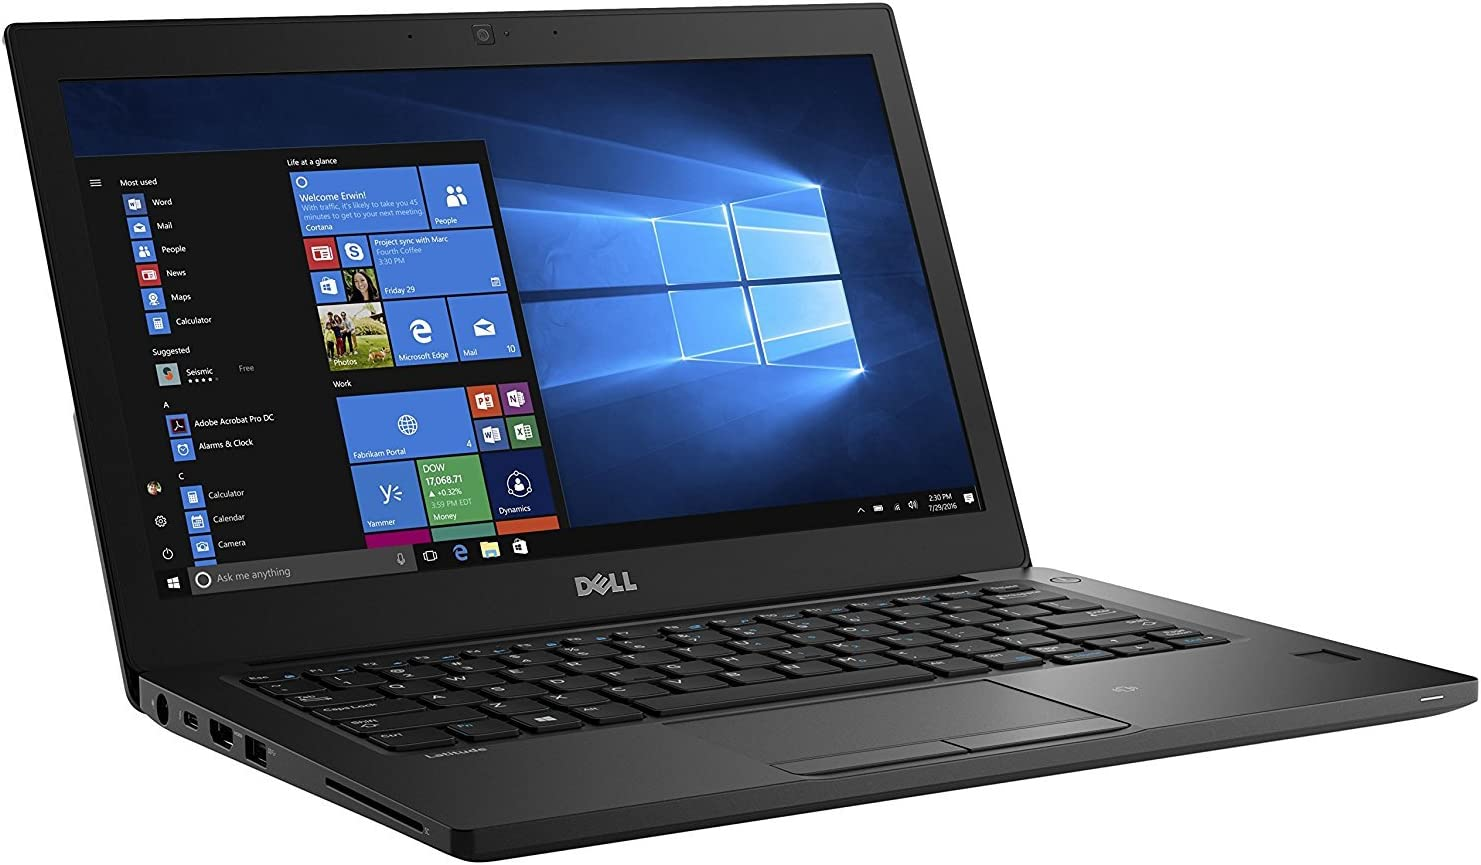 Dell Latitude 12 7000 7280 Notebook: Intel Core i5-6300U | 256GB SSD | 8GB DDR4 | 12.5